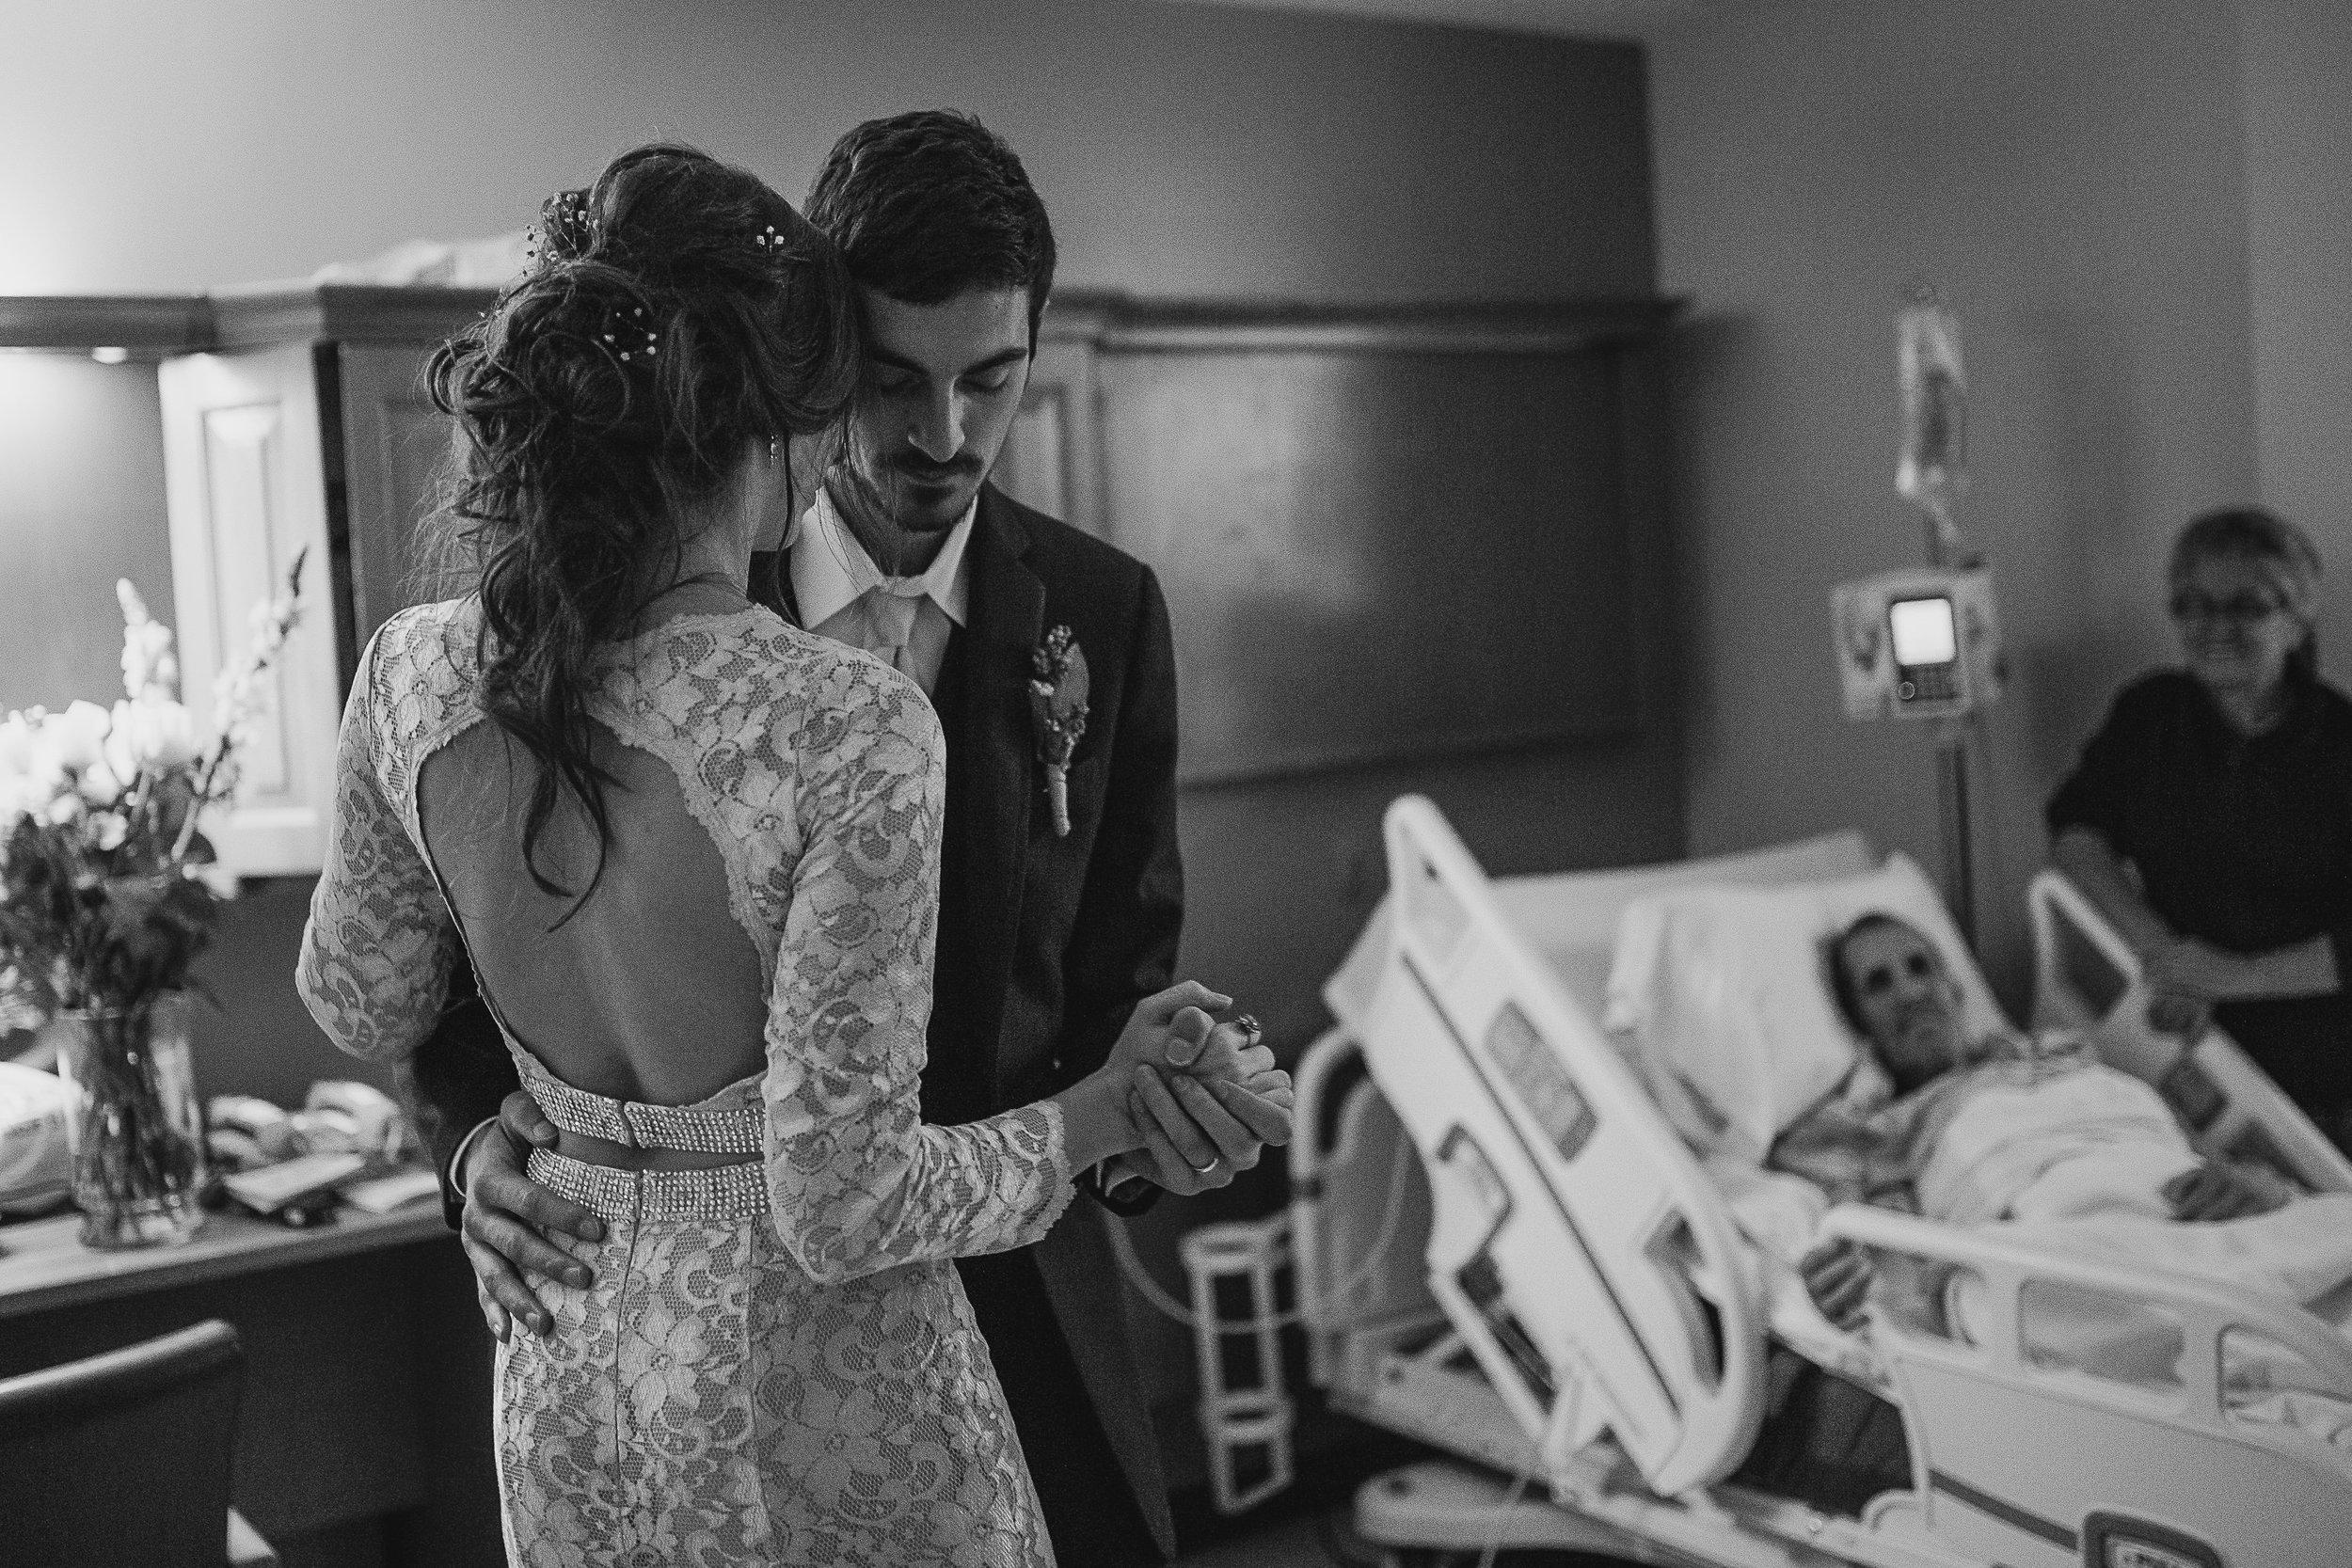 memphis-wedding-photographer-cassie-cook-photography-loya-first-dance